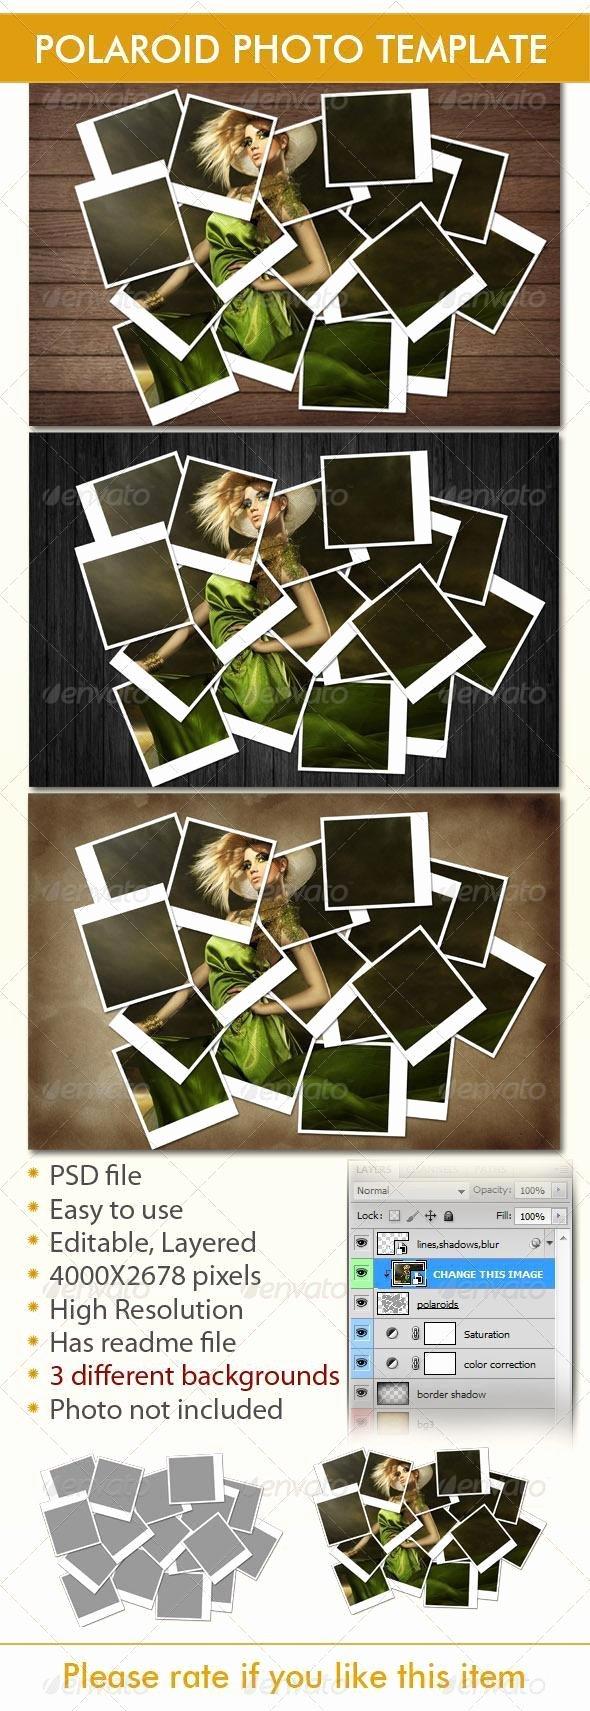 Polaroid Frame Psd Elegant 20 Polaroid Mockup Psd Templates Collection